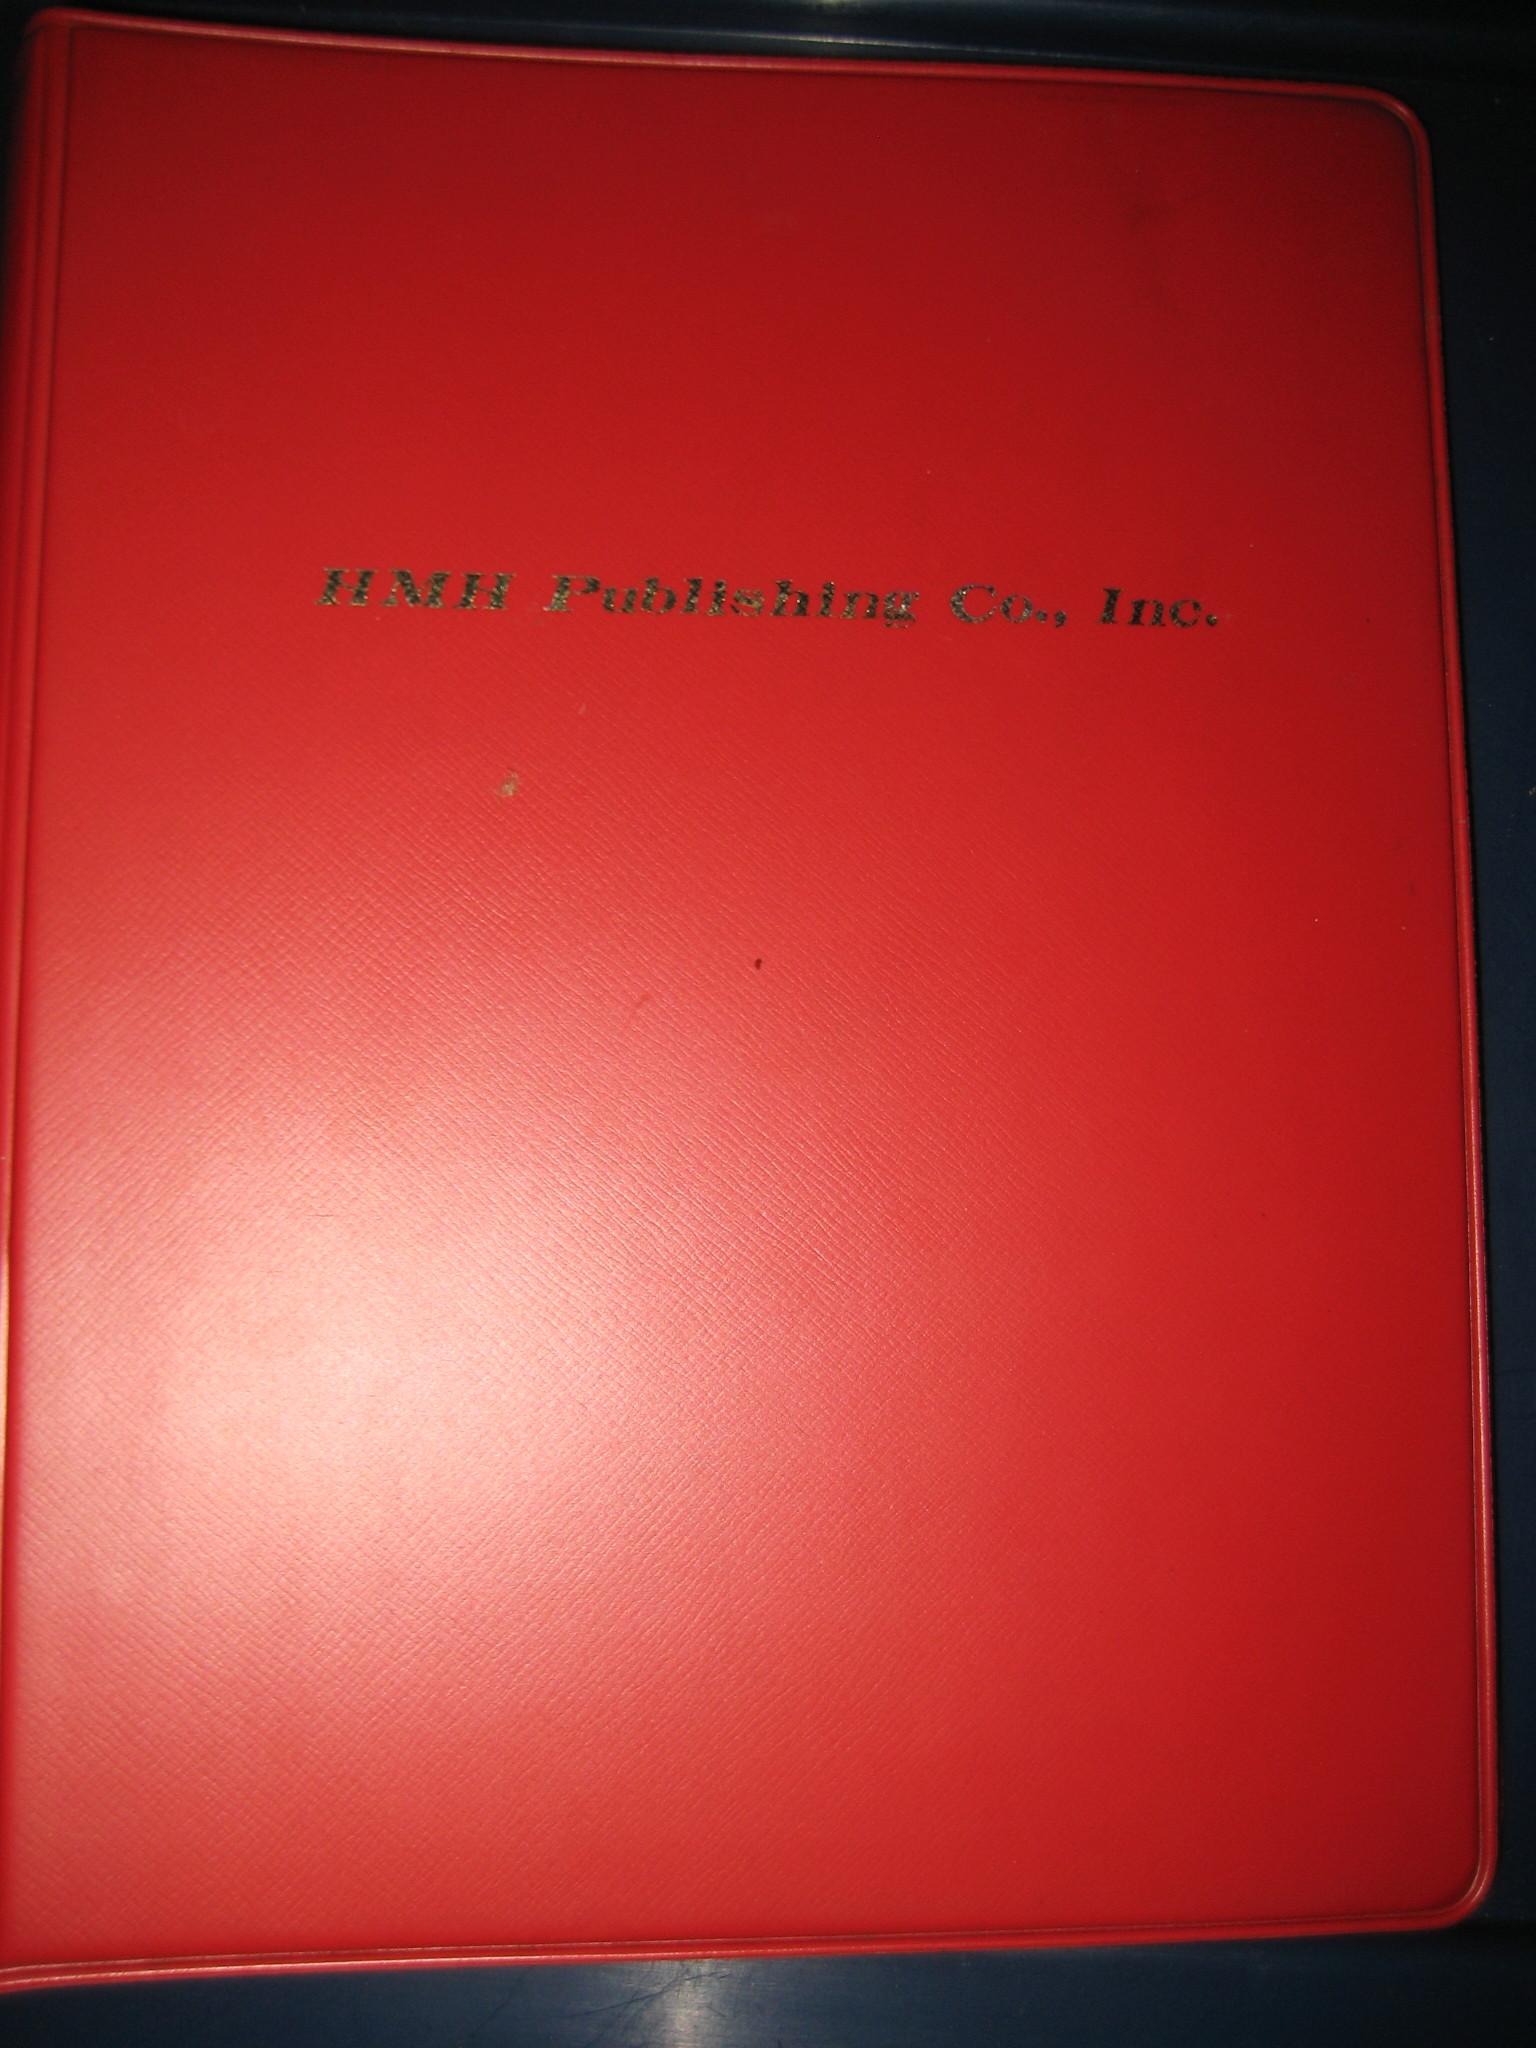 1962 Playboy Employee Handbook